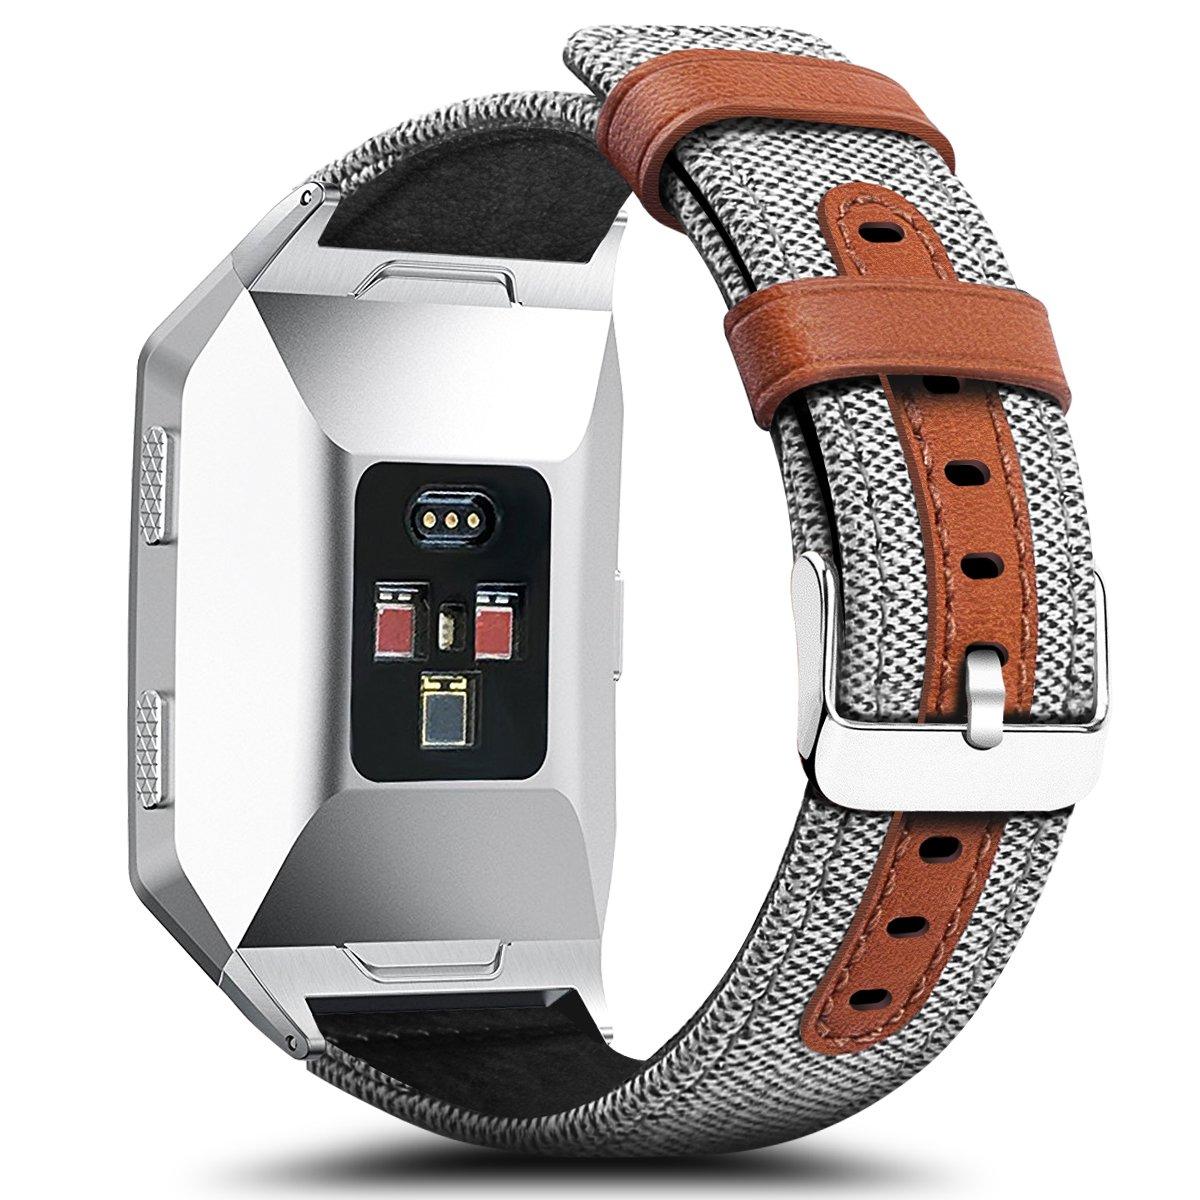 Para Fitbit Ionic - Bandas gran pequeño, cidetty Tejido Tejido de ...